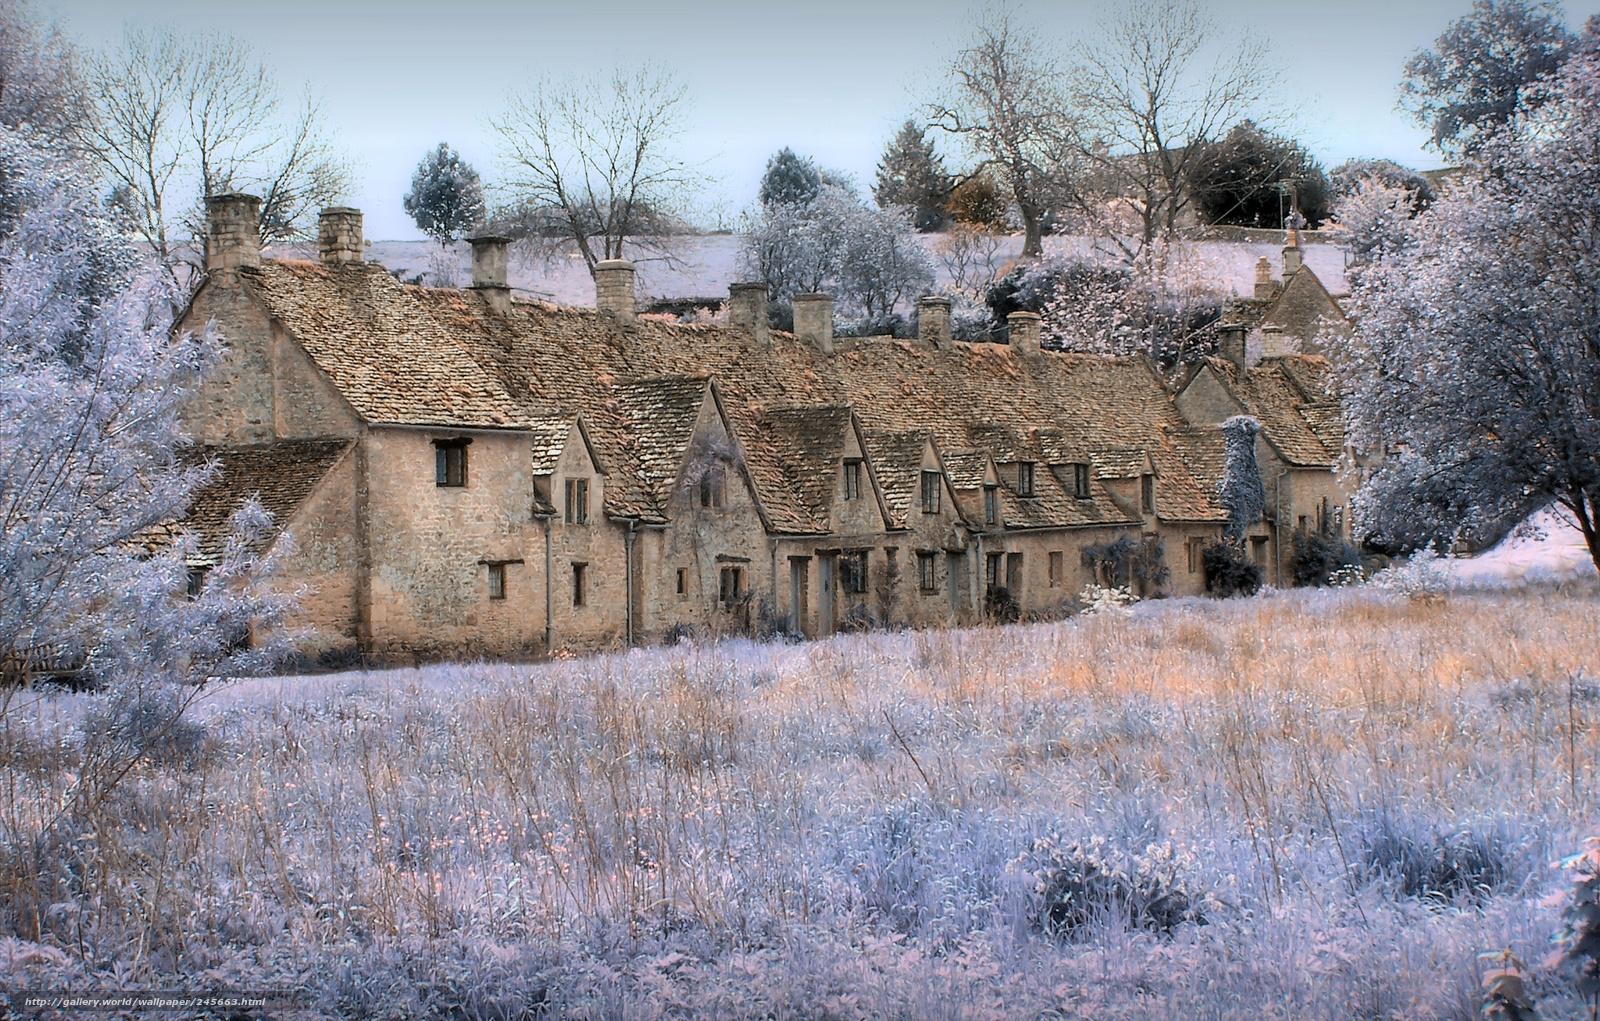 Download wallpaper england bieber bibury cottages free for Wallpaper home england